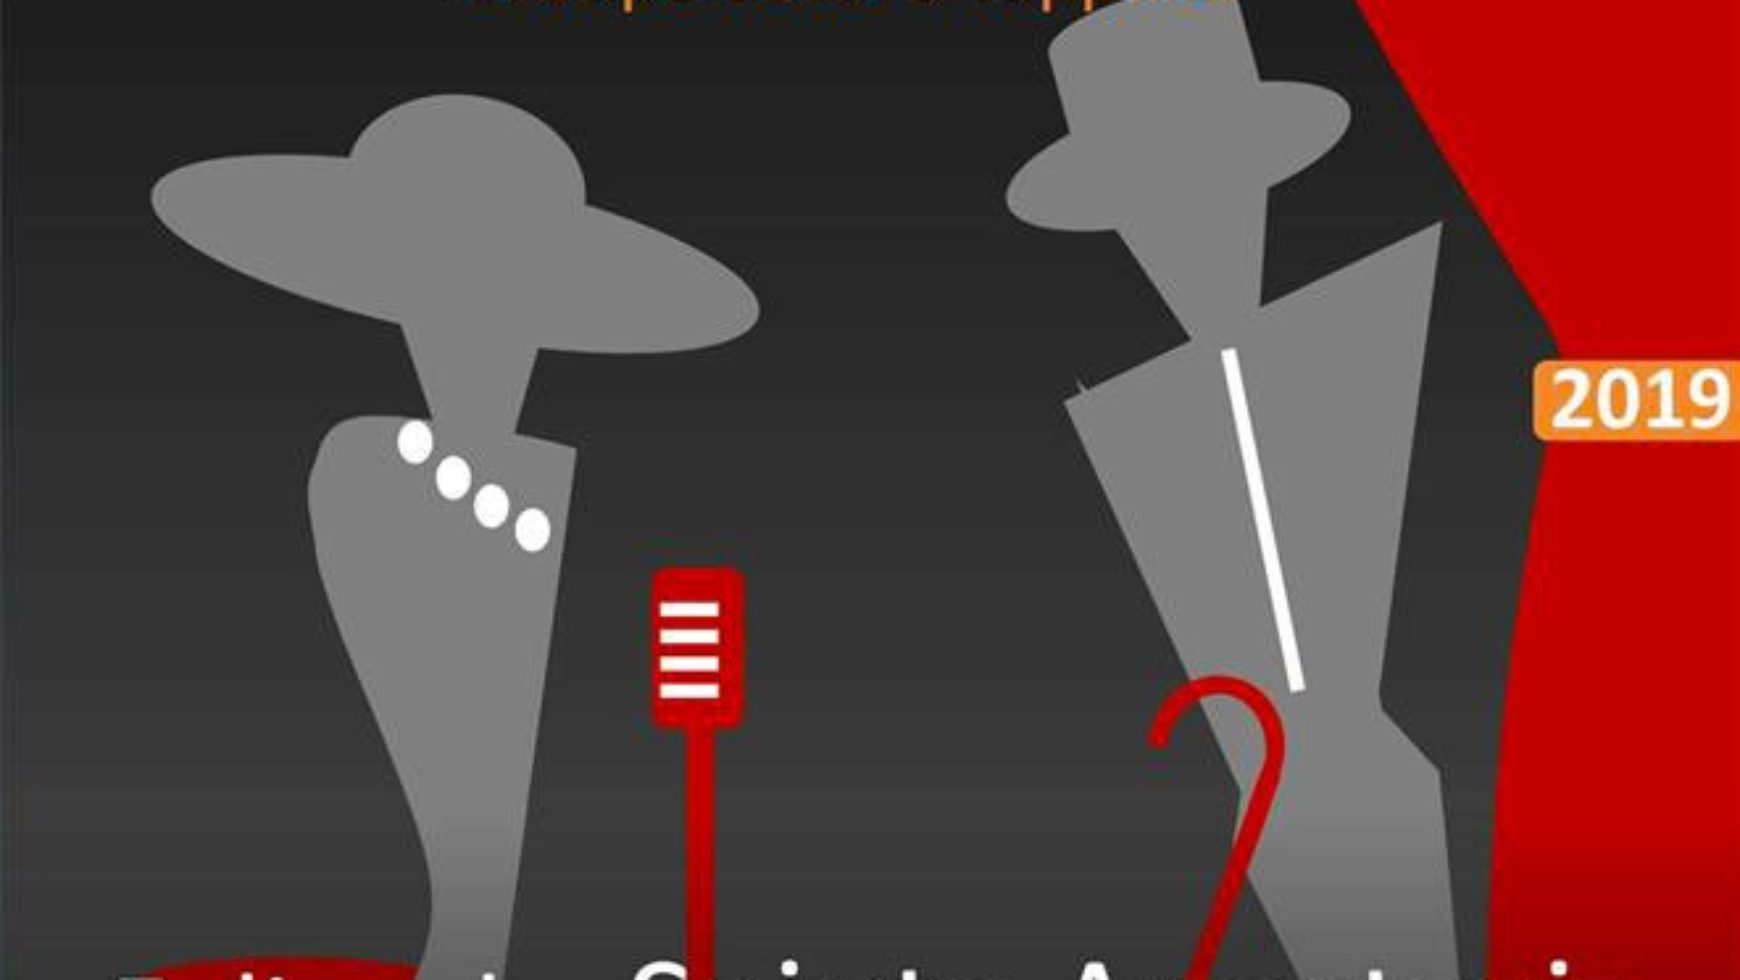 Concert de Jazz au profit de l'association ADESA – 3 Août 2019